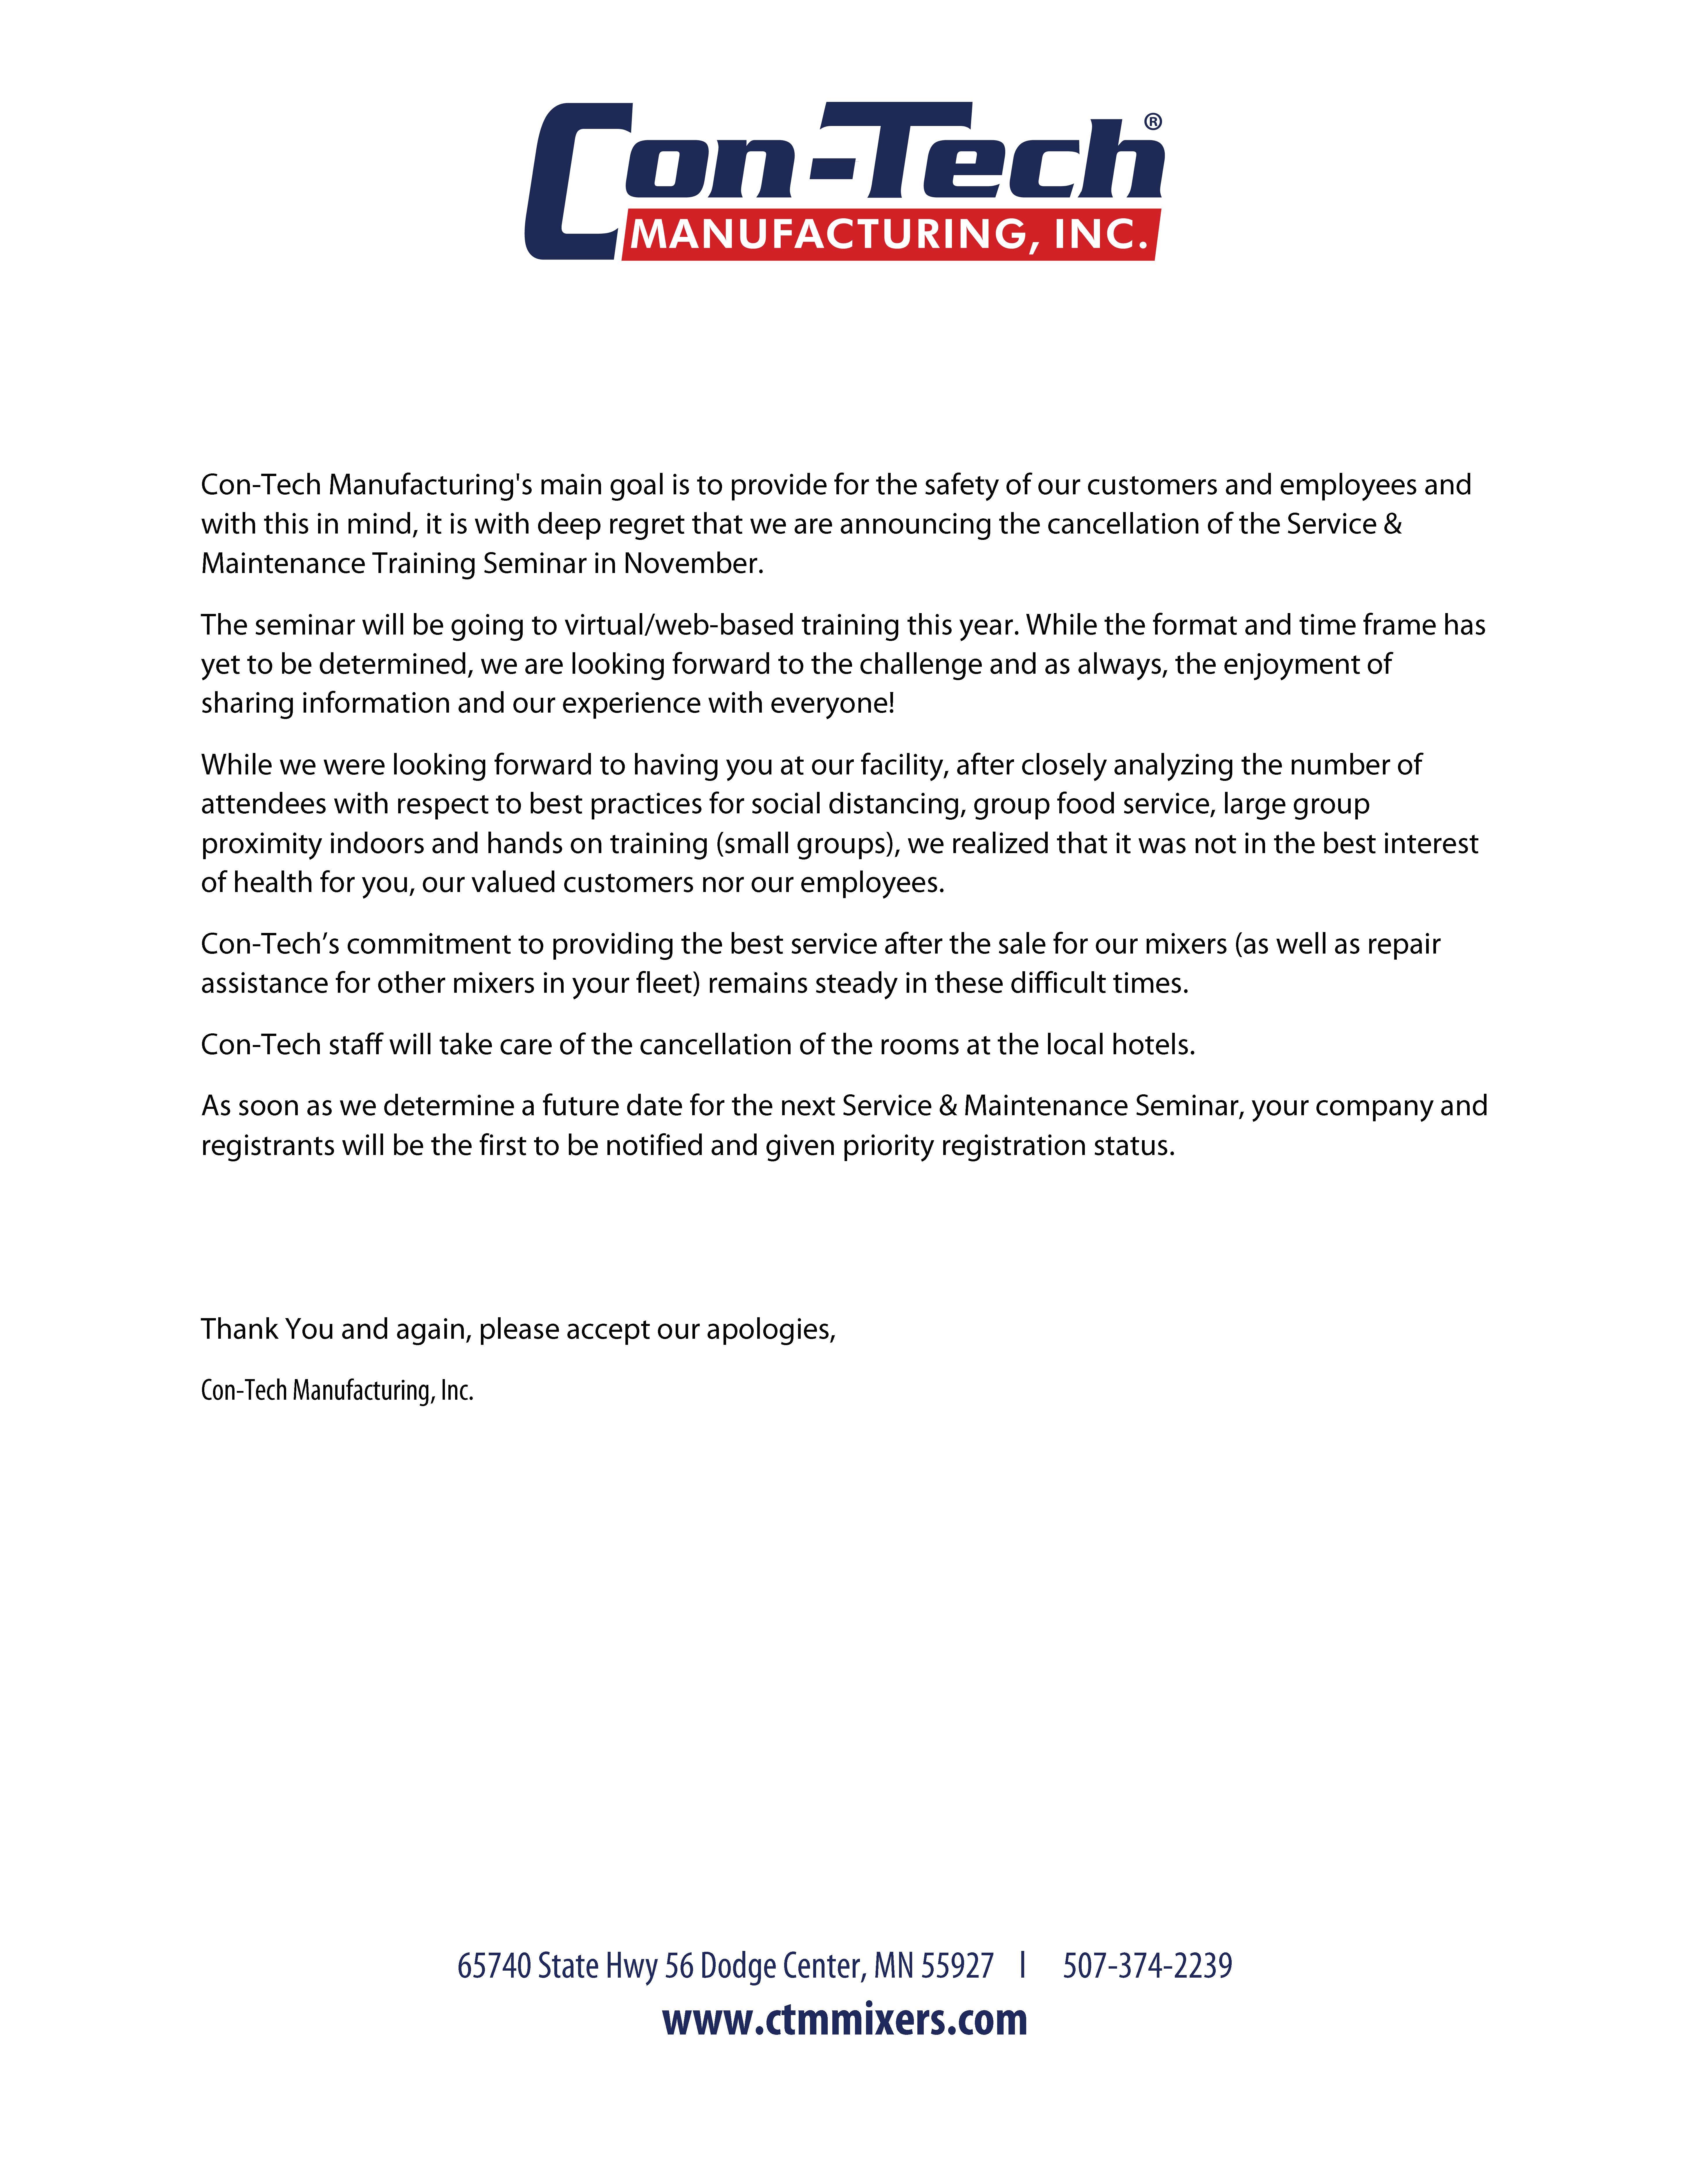 cancellation-letter.jpg